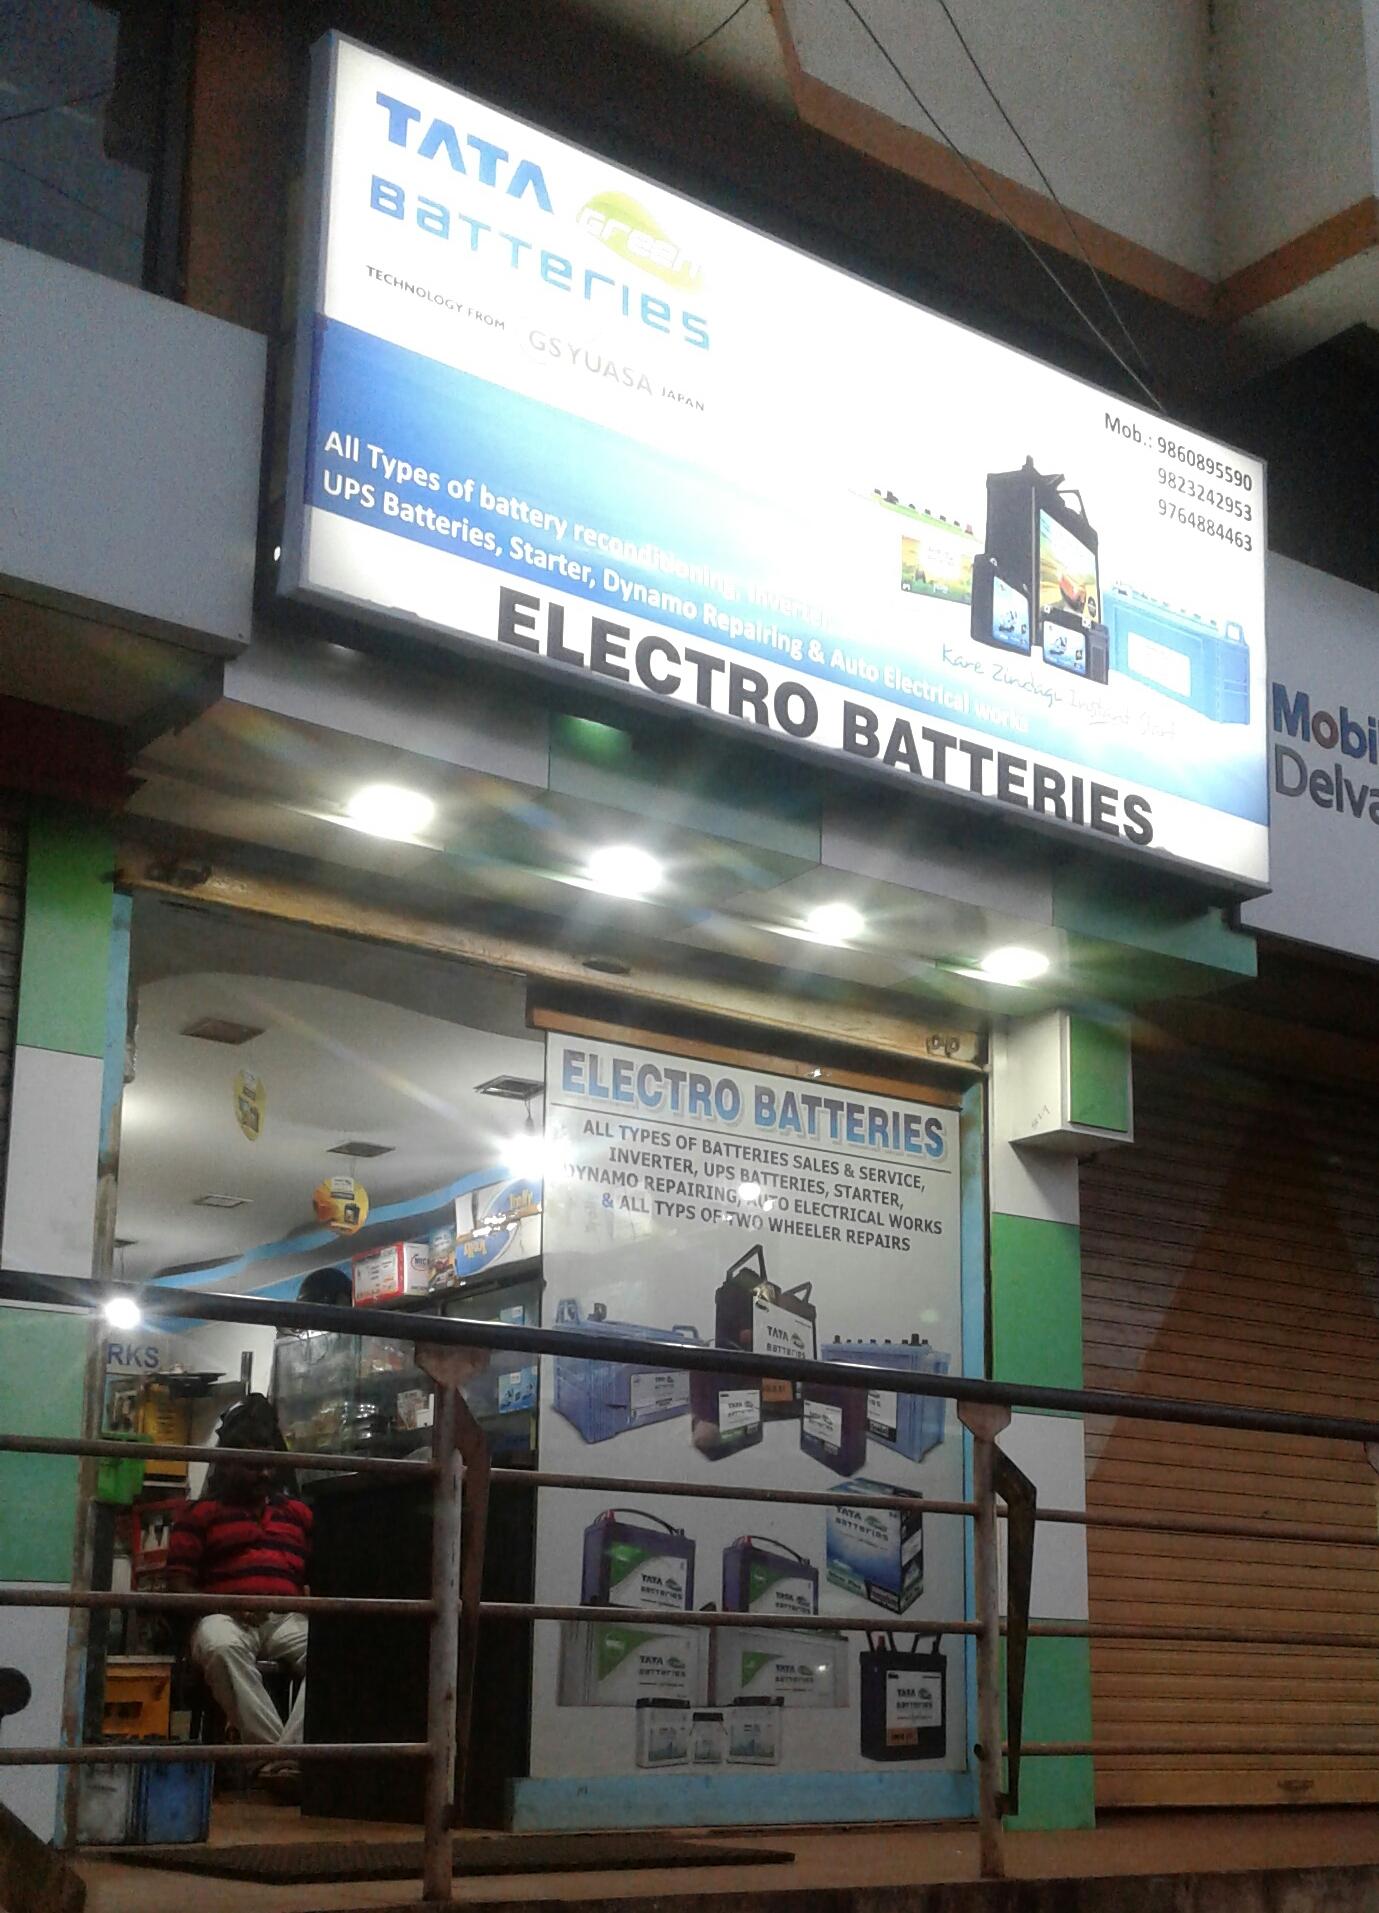 Electro batteries